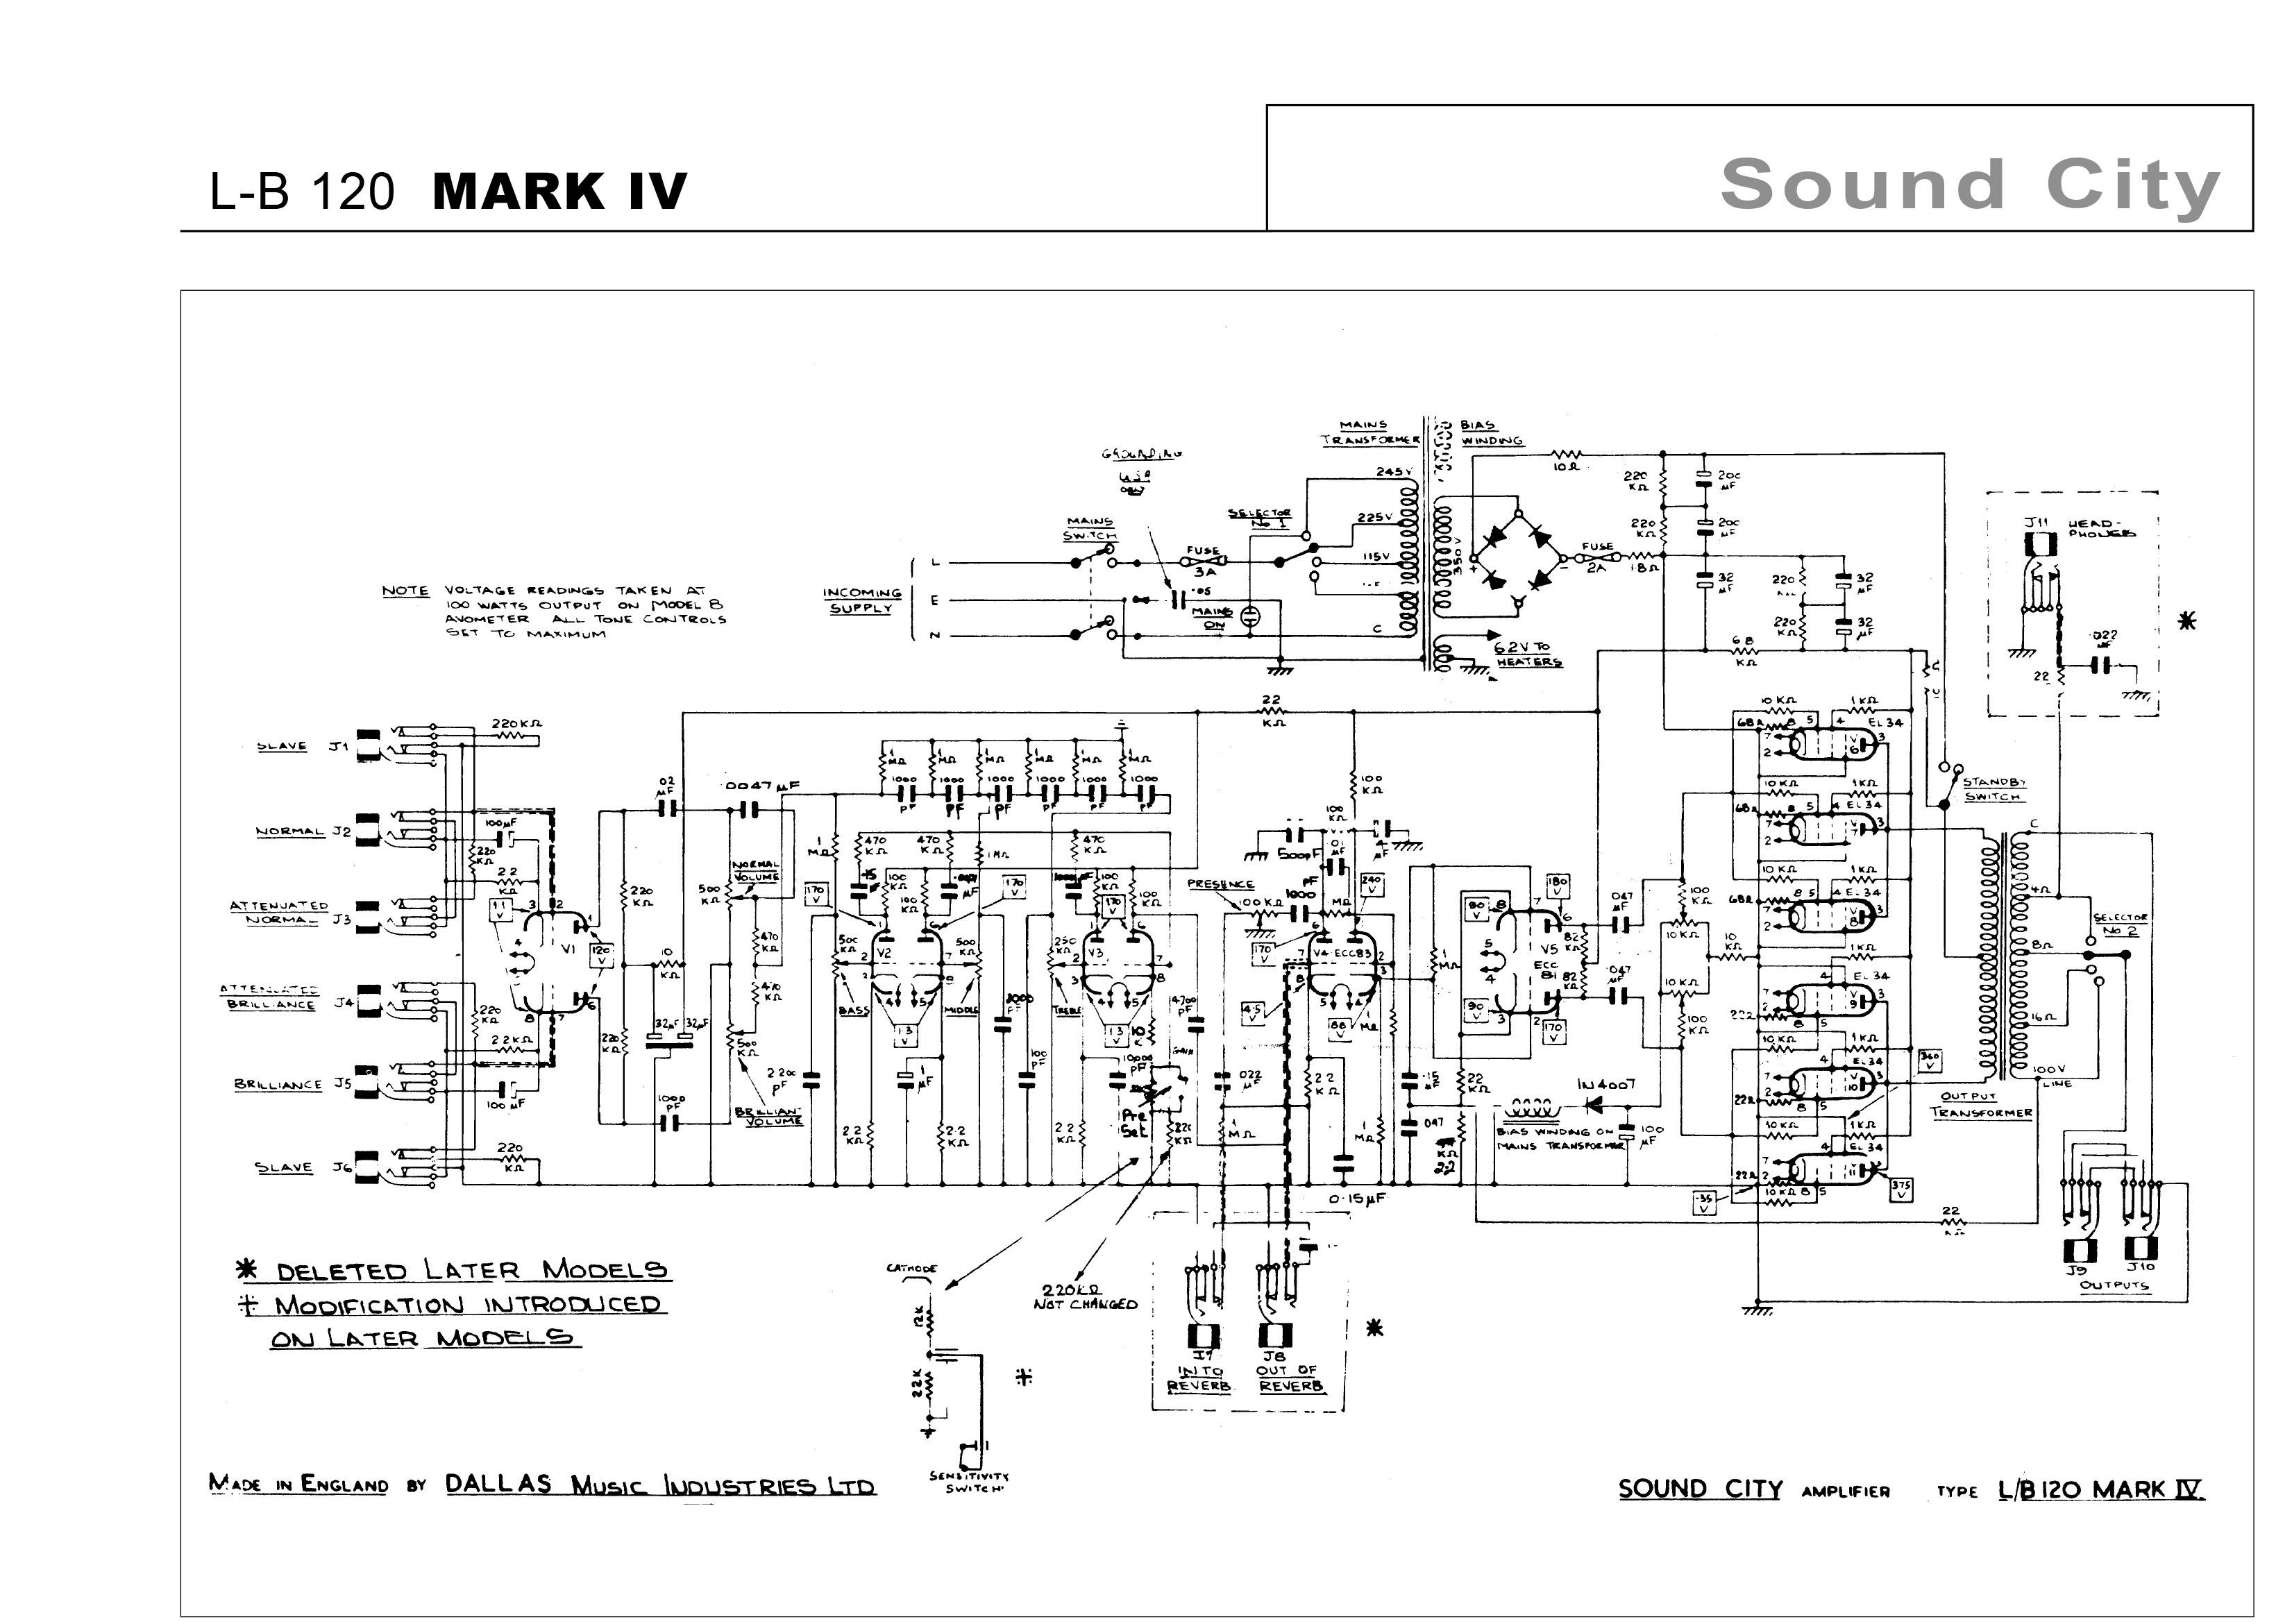 sound city 120 mark iv